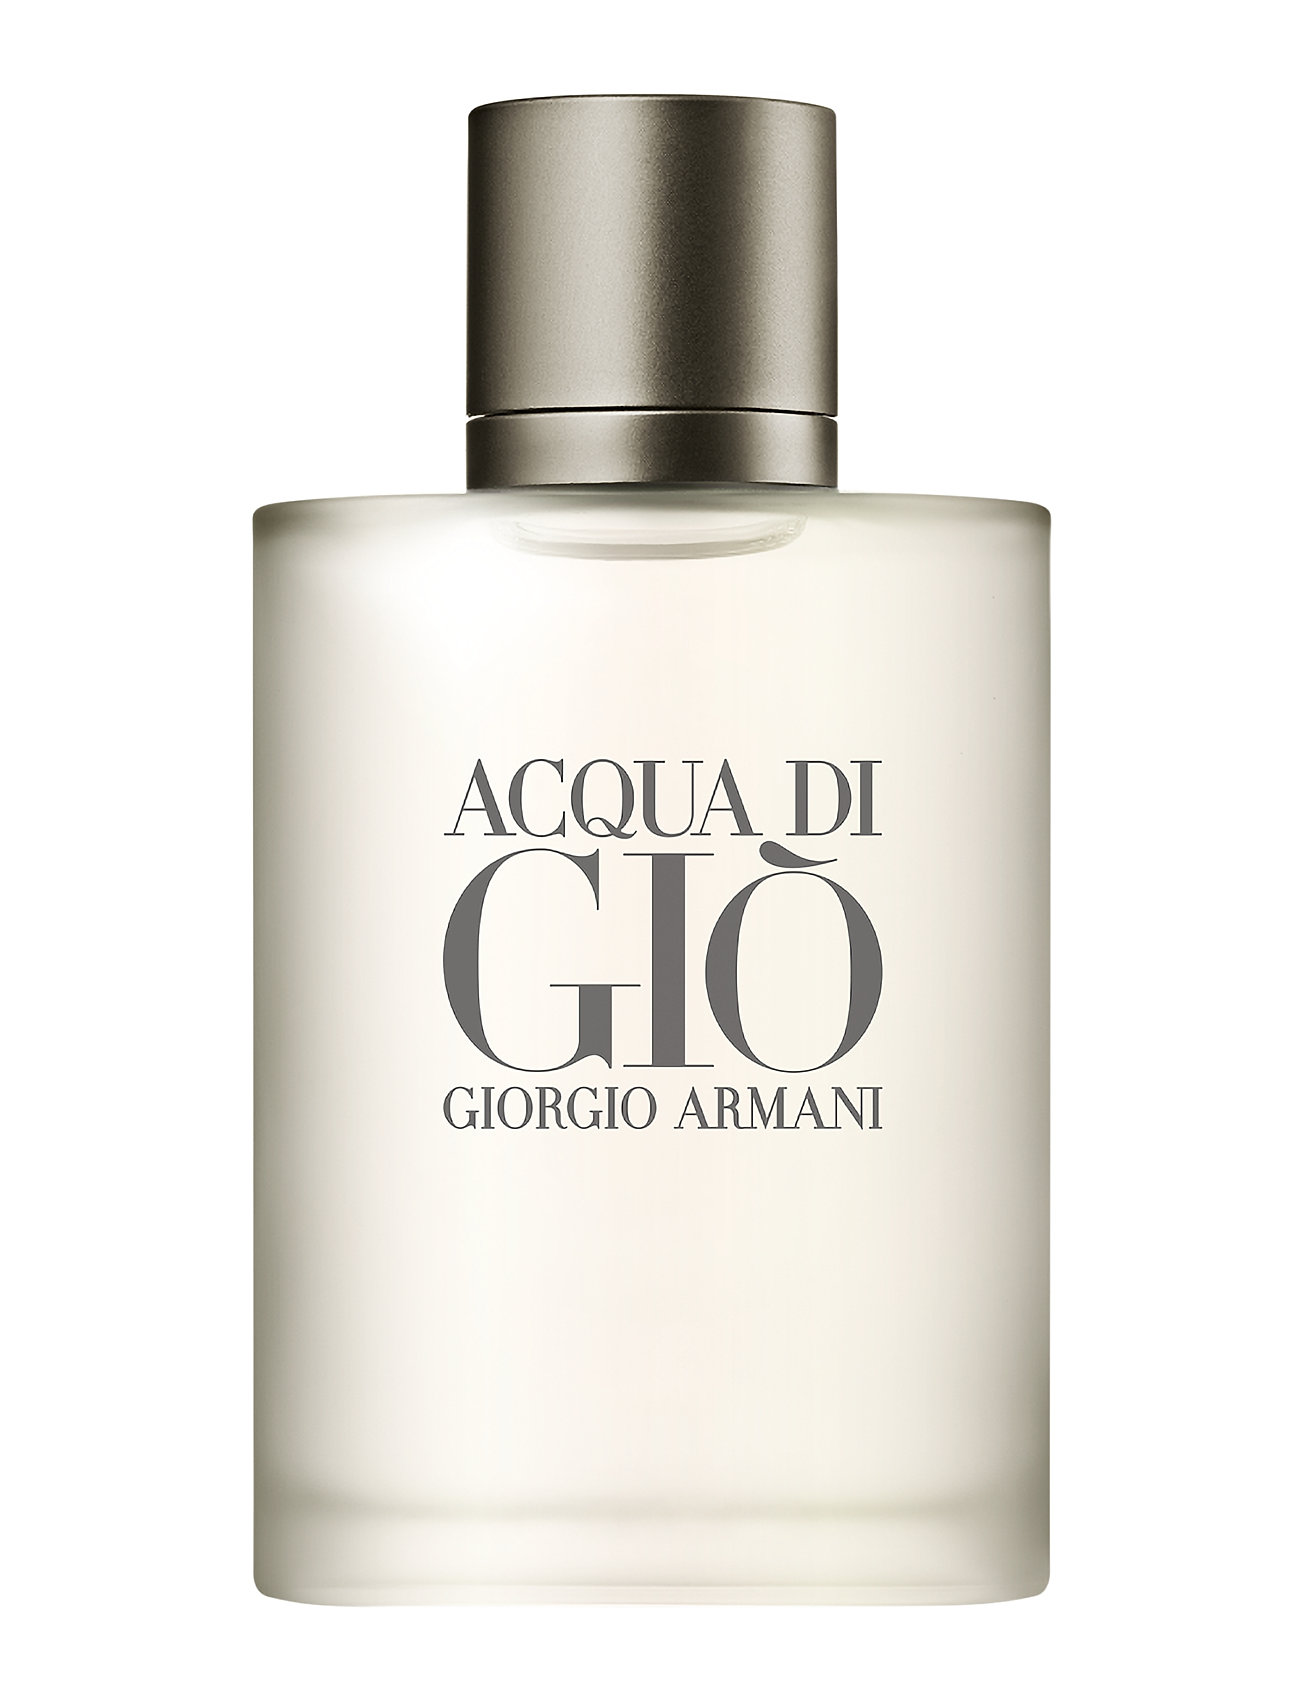 Giorgio Armani Acqua Di Giò Pour Homme Eau de Toilette 50 ml - NO COLOR CODE